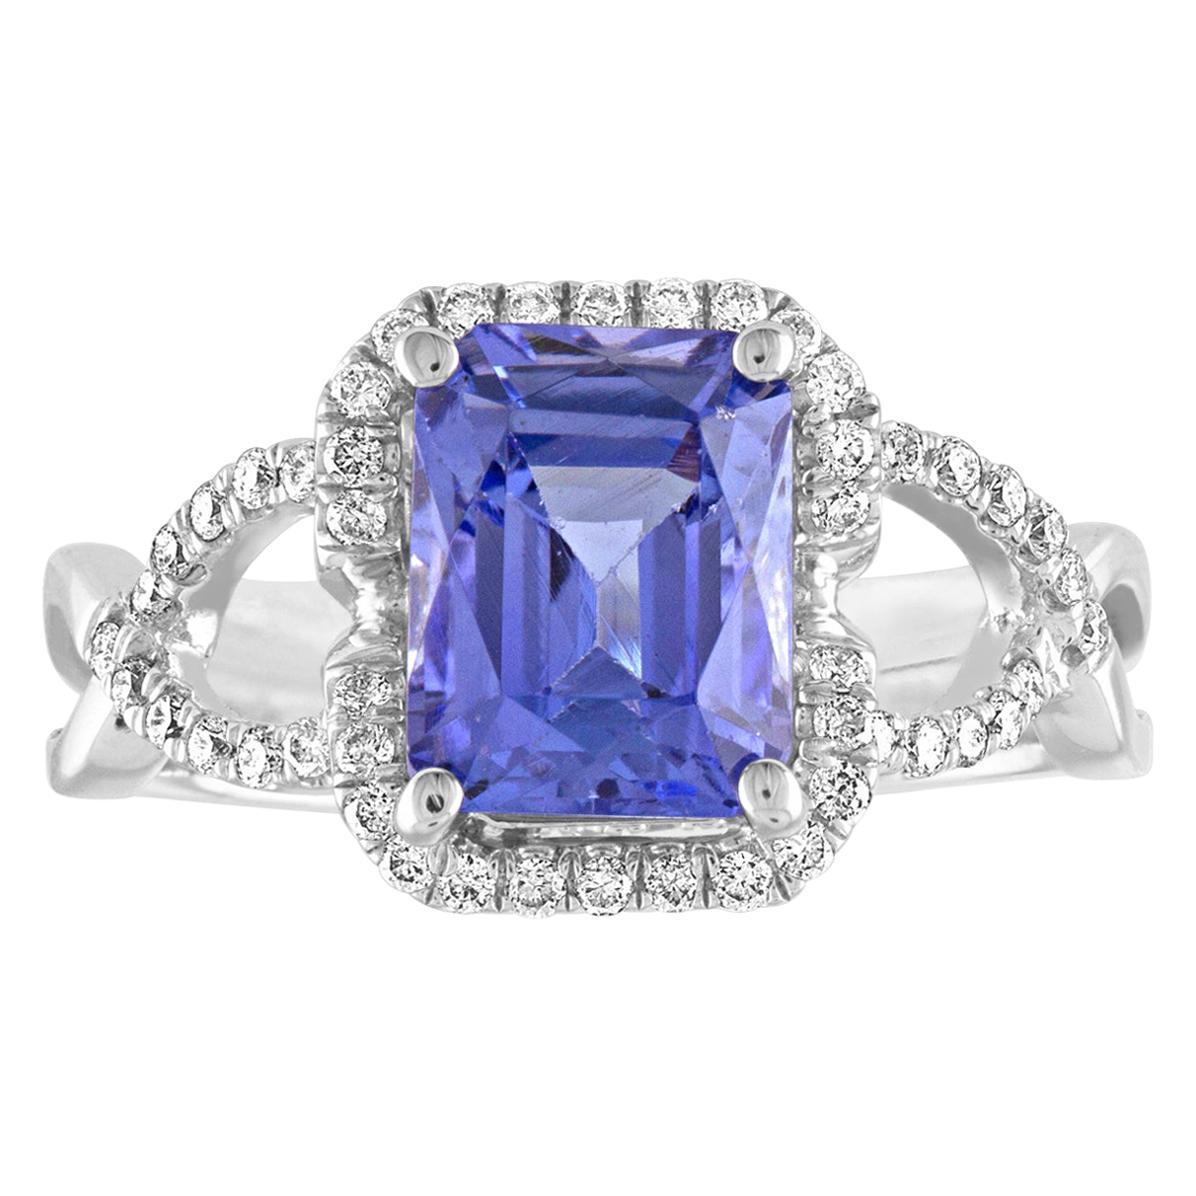 2.97 Carat Radiant Cut Tanzanite Diamond Gold Ring